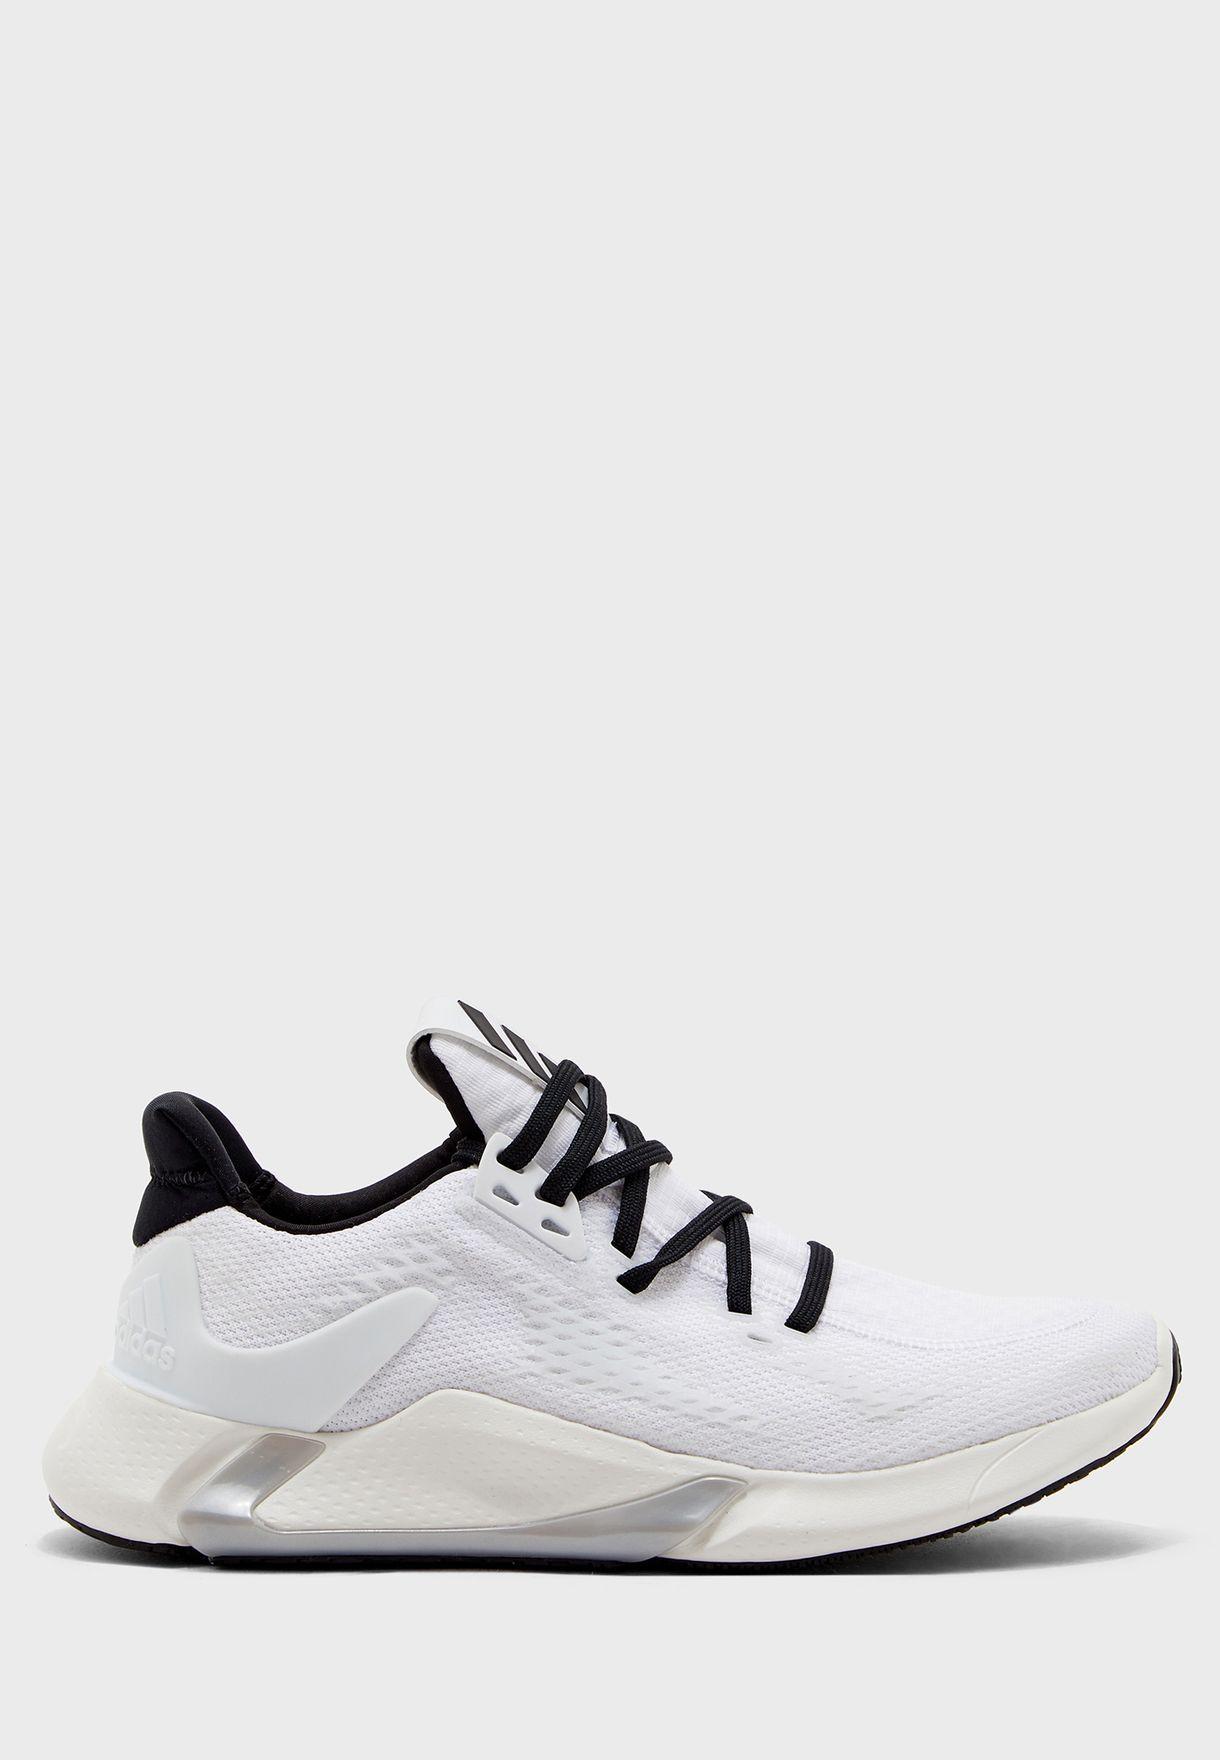 Laufschuhe Sortendesign besondere Auswahl an adidas